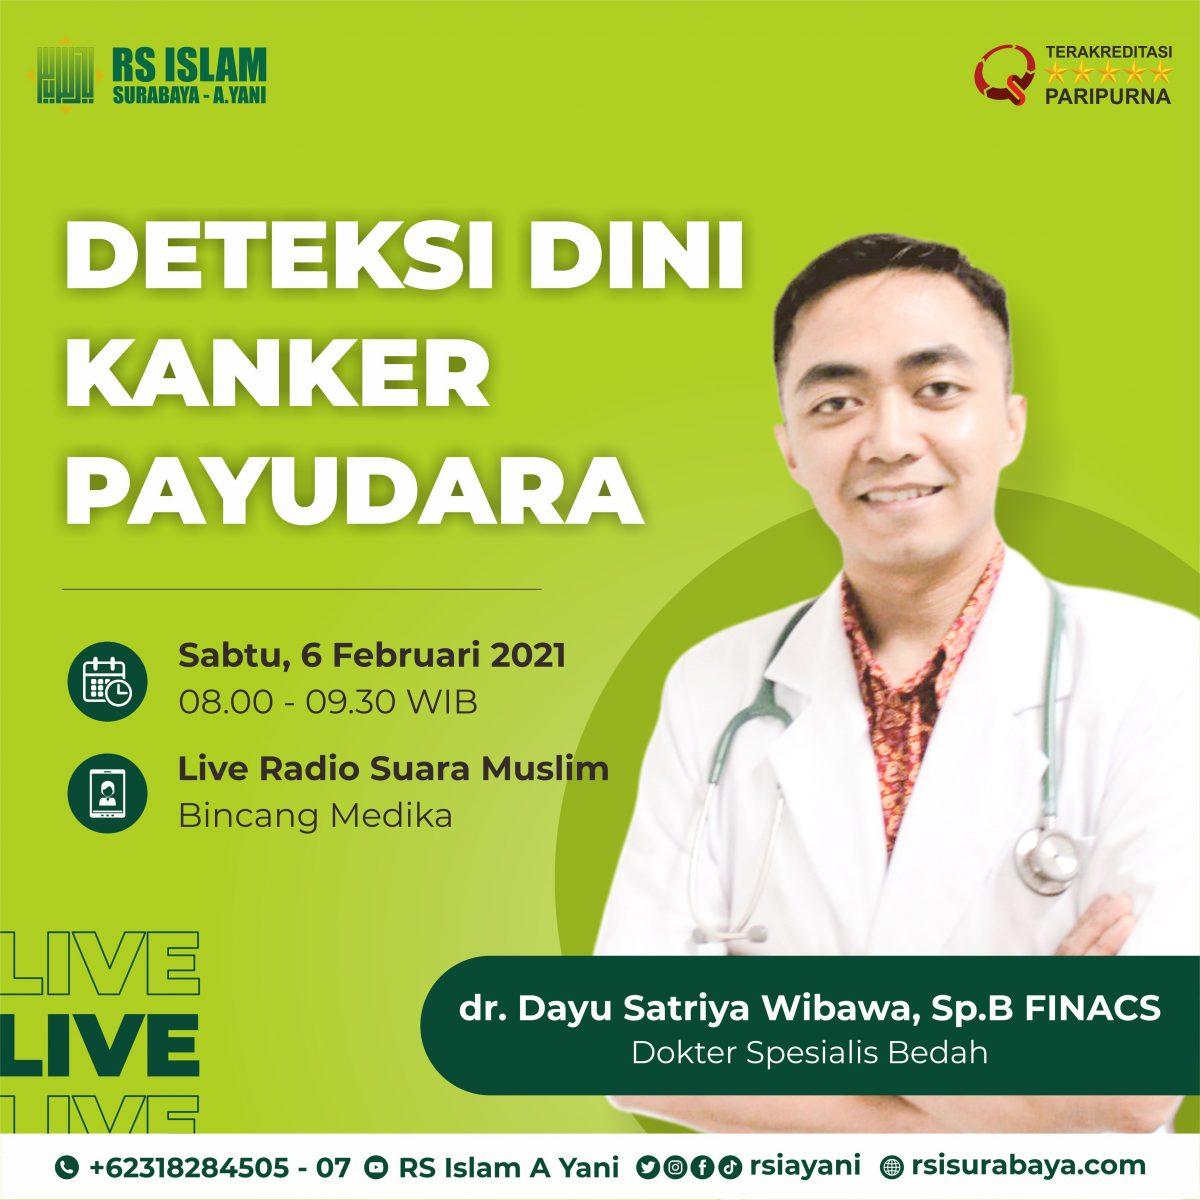 Live-Deteksi-Dini-Kanker-Payudara-1200x1200.jpg